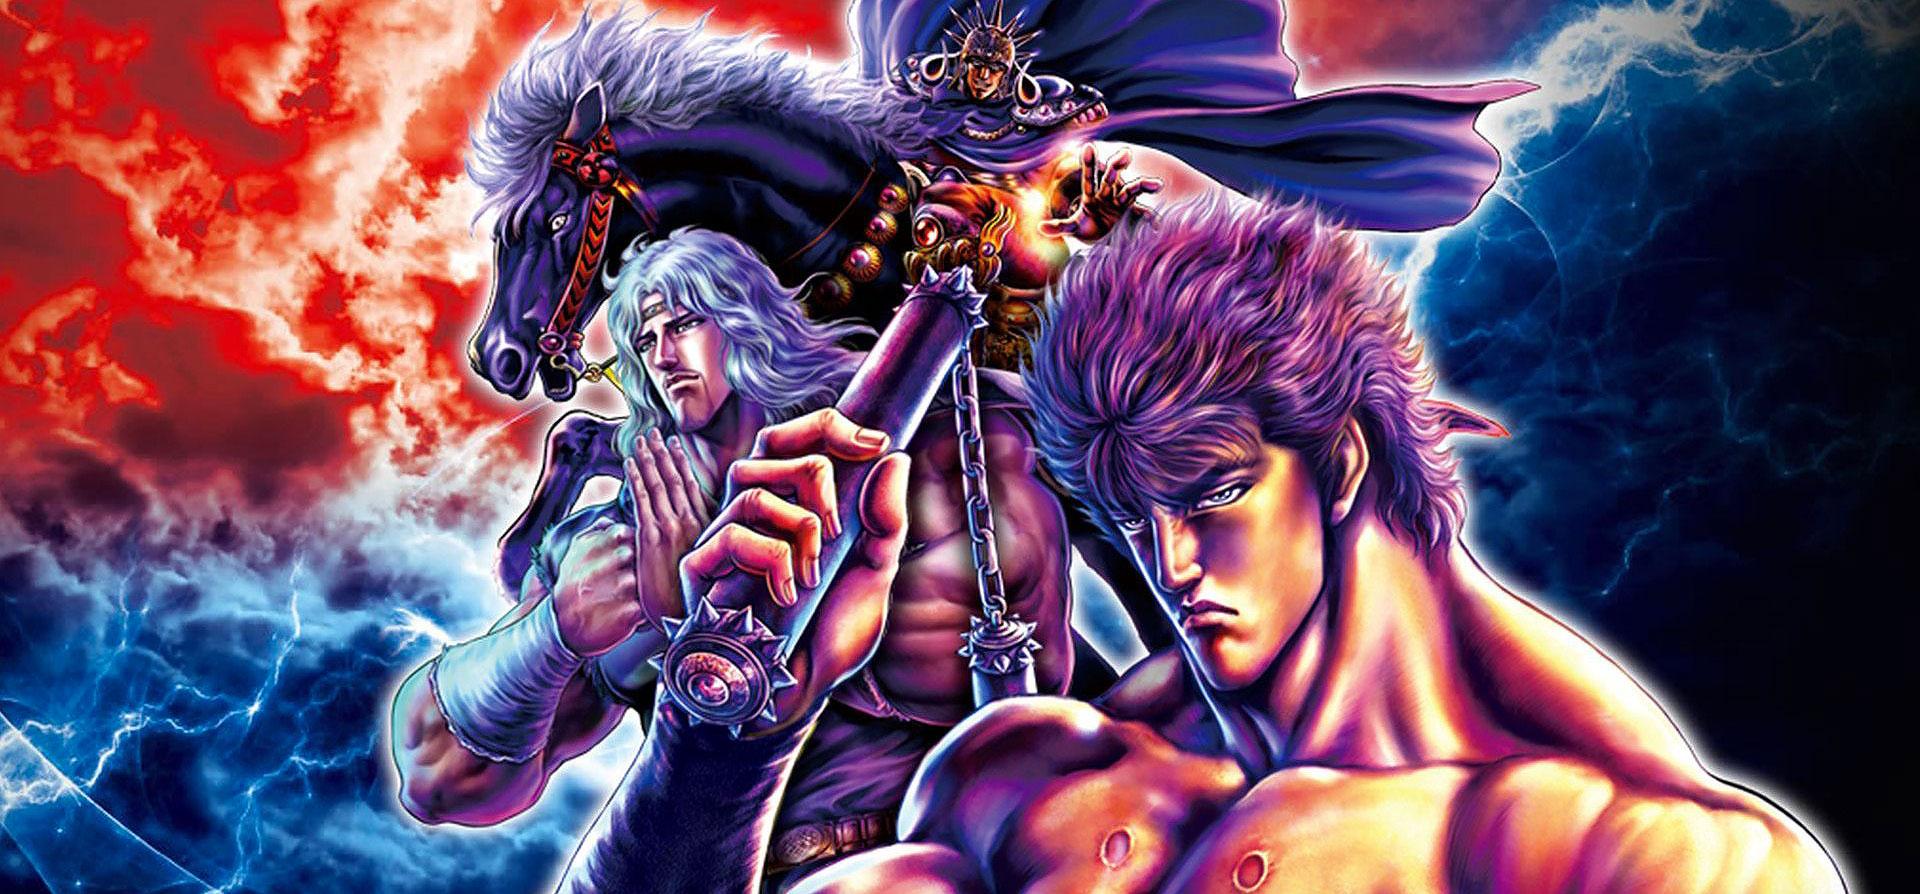 Hokuto no Ken - Ken il Guerriero